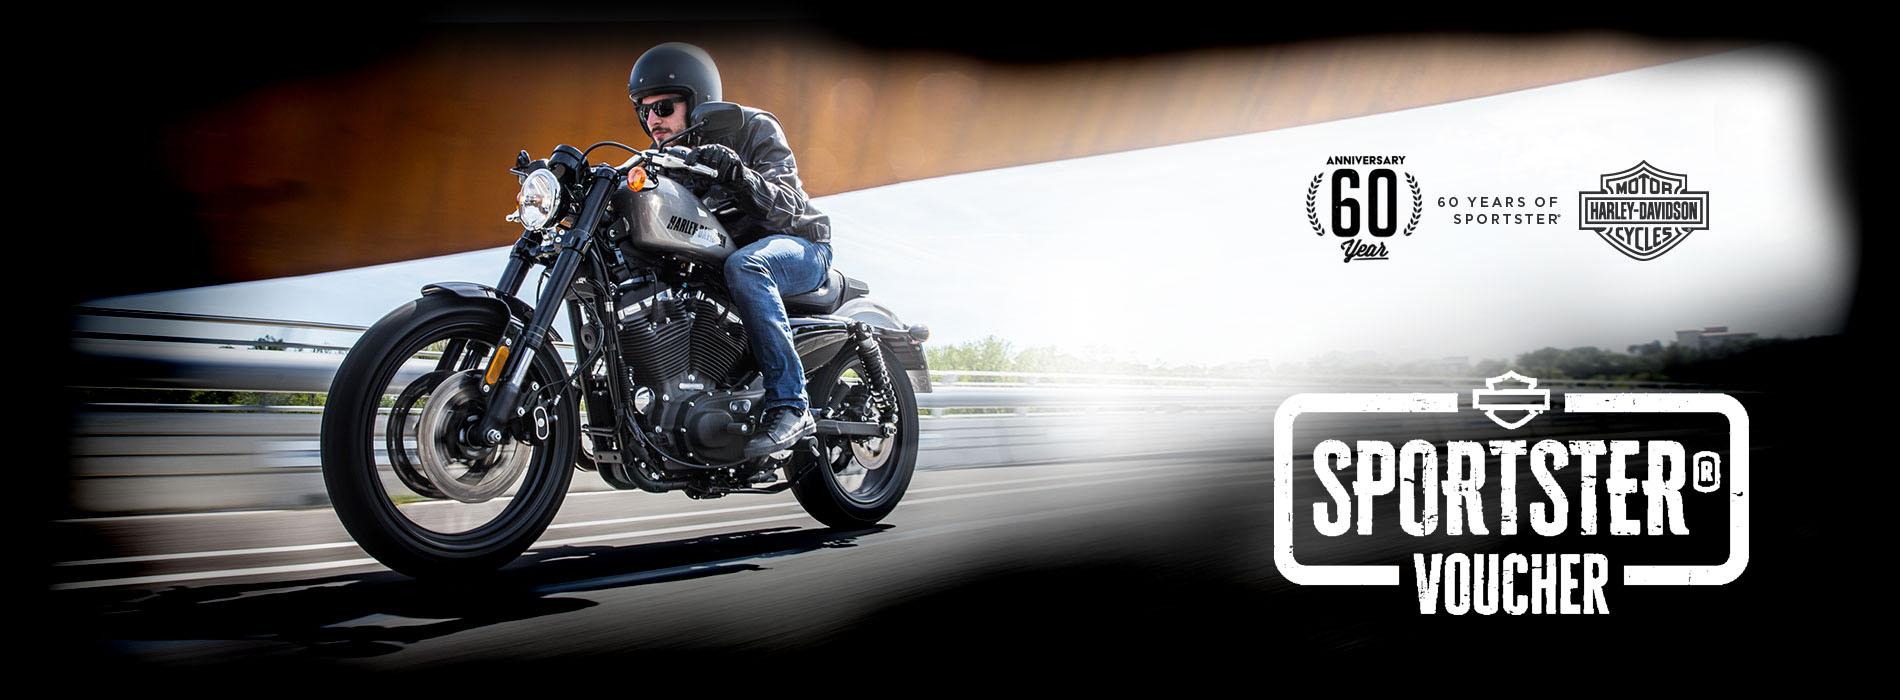 Voucher na motorky Harley-Davidson Sportster 2017